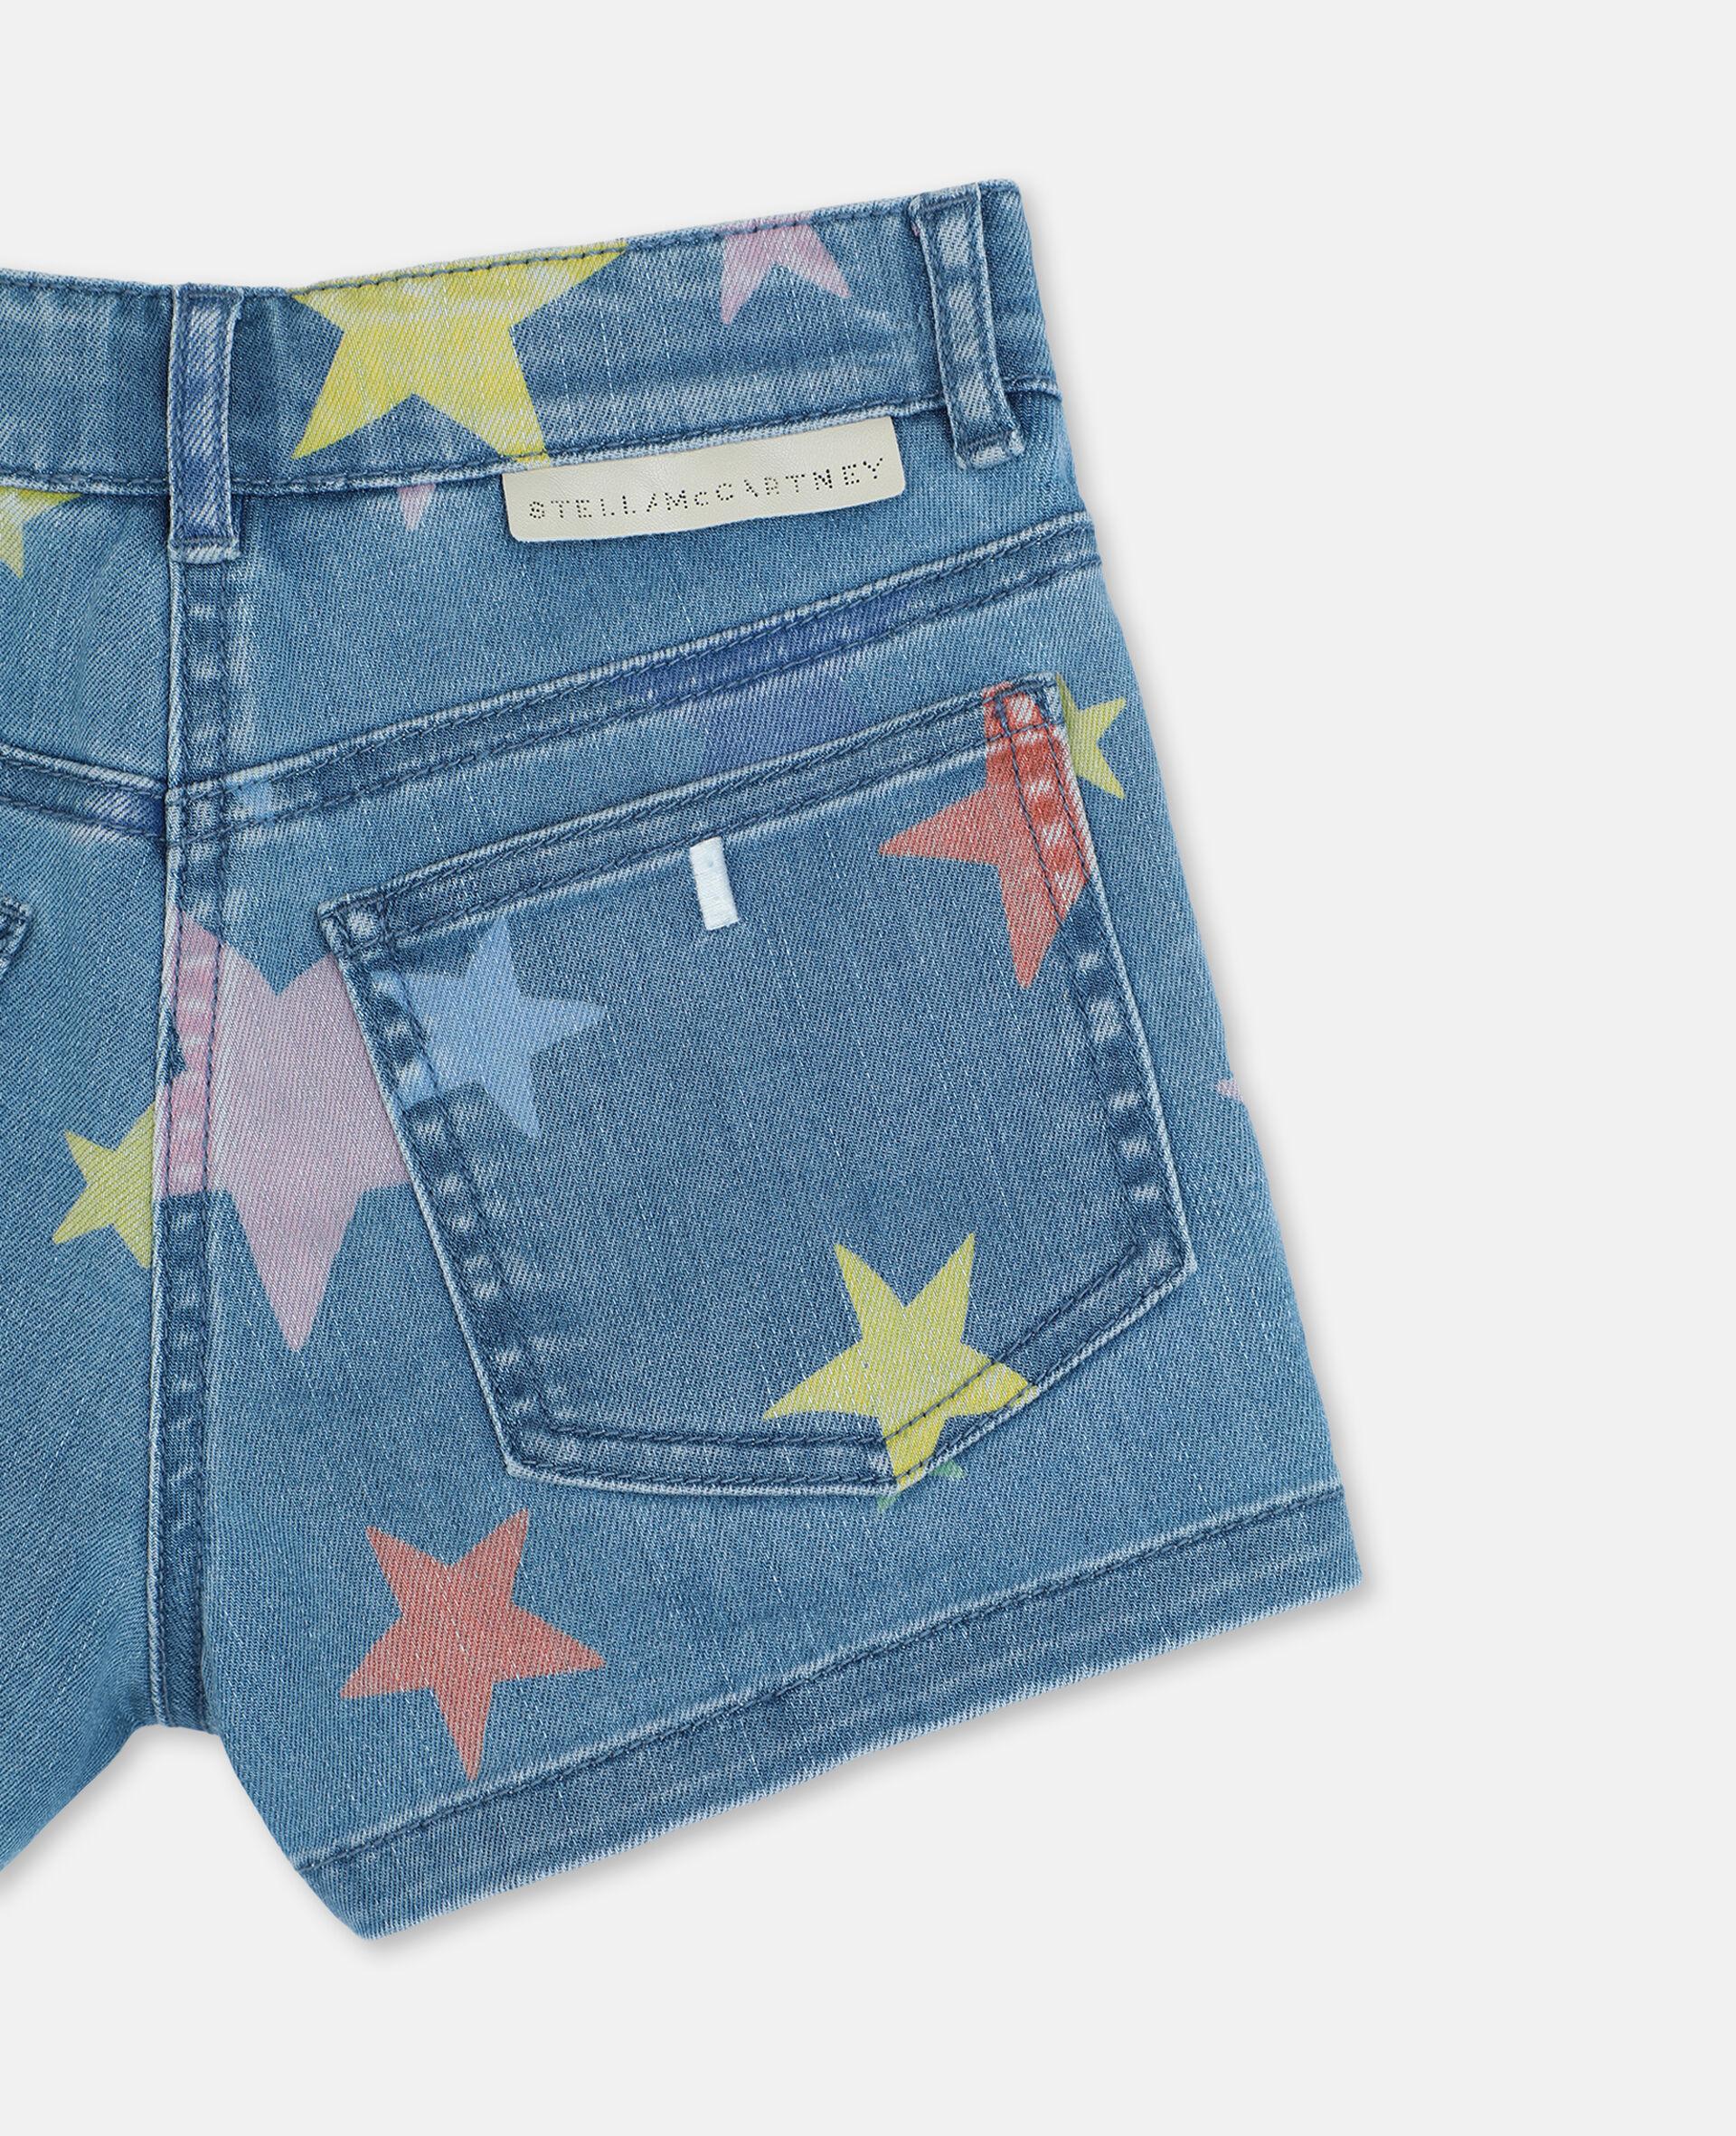 Multicolour Stars Denim Shorts -Multicolour-large image number 2